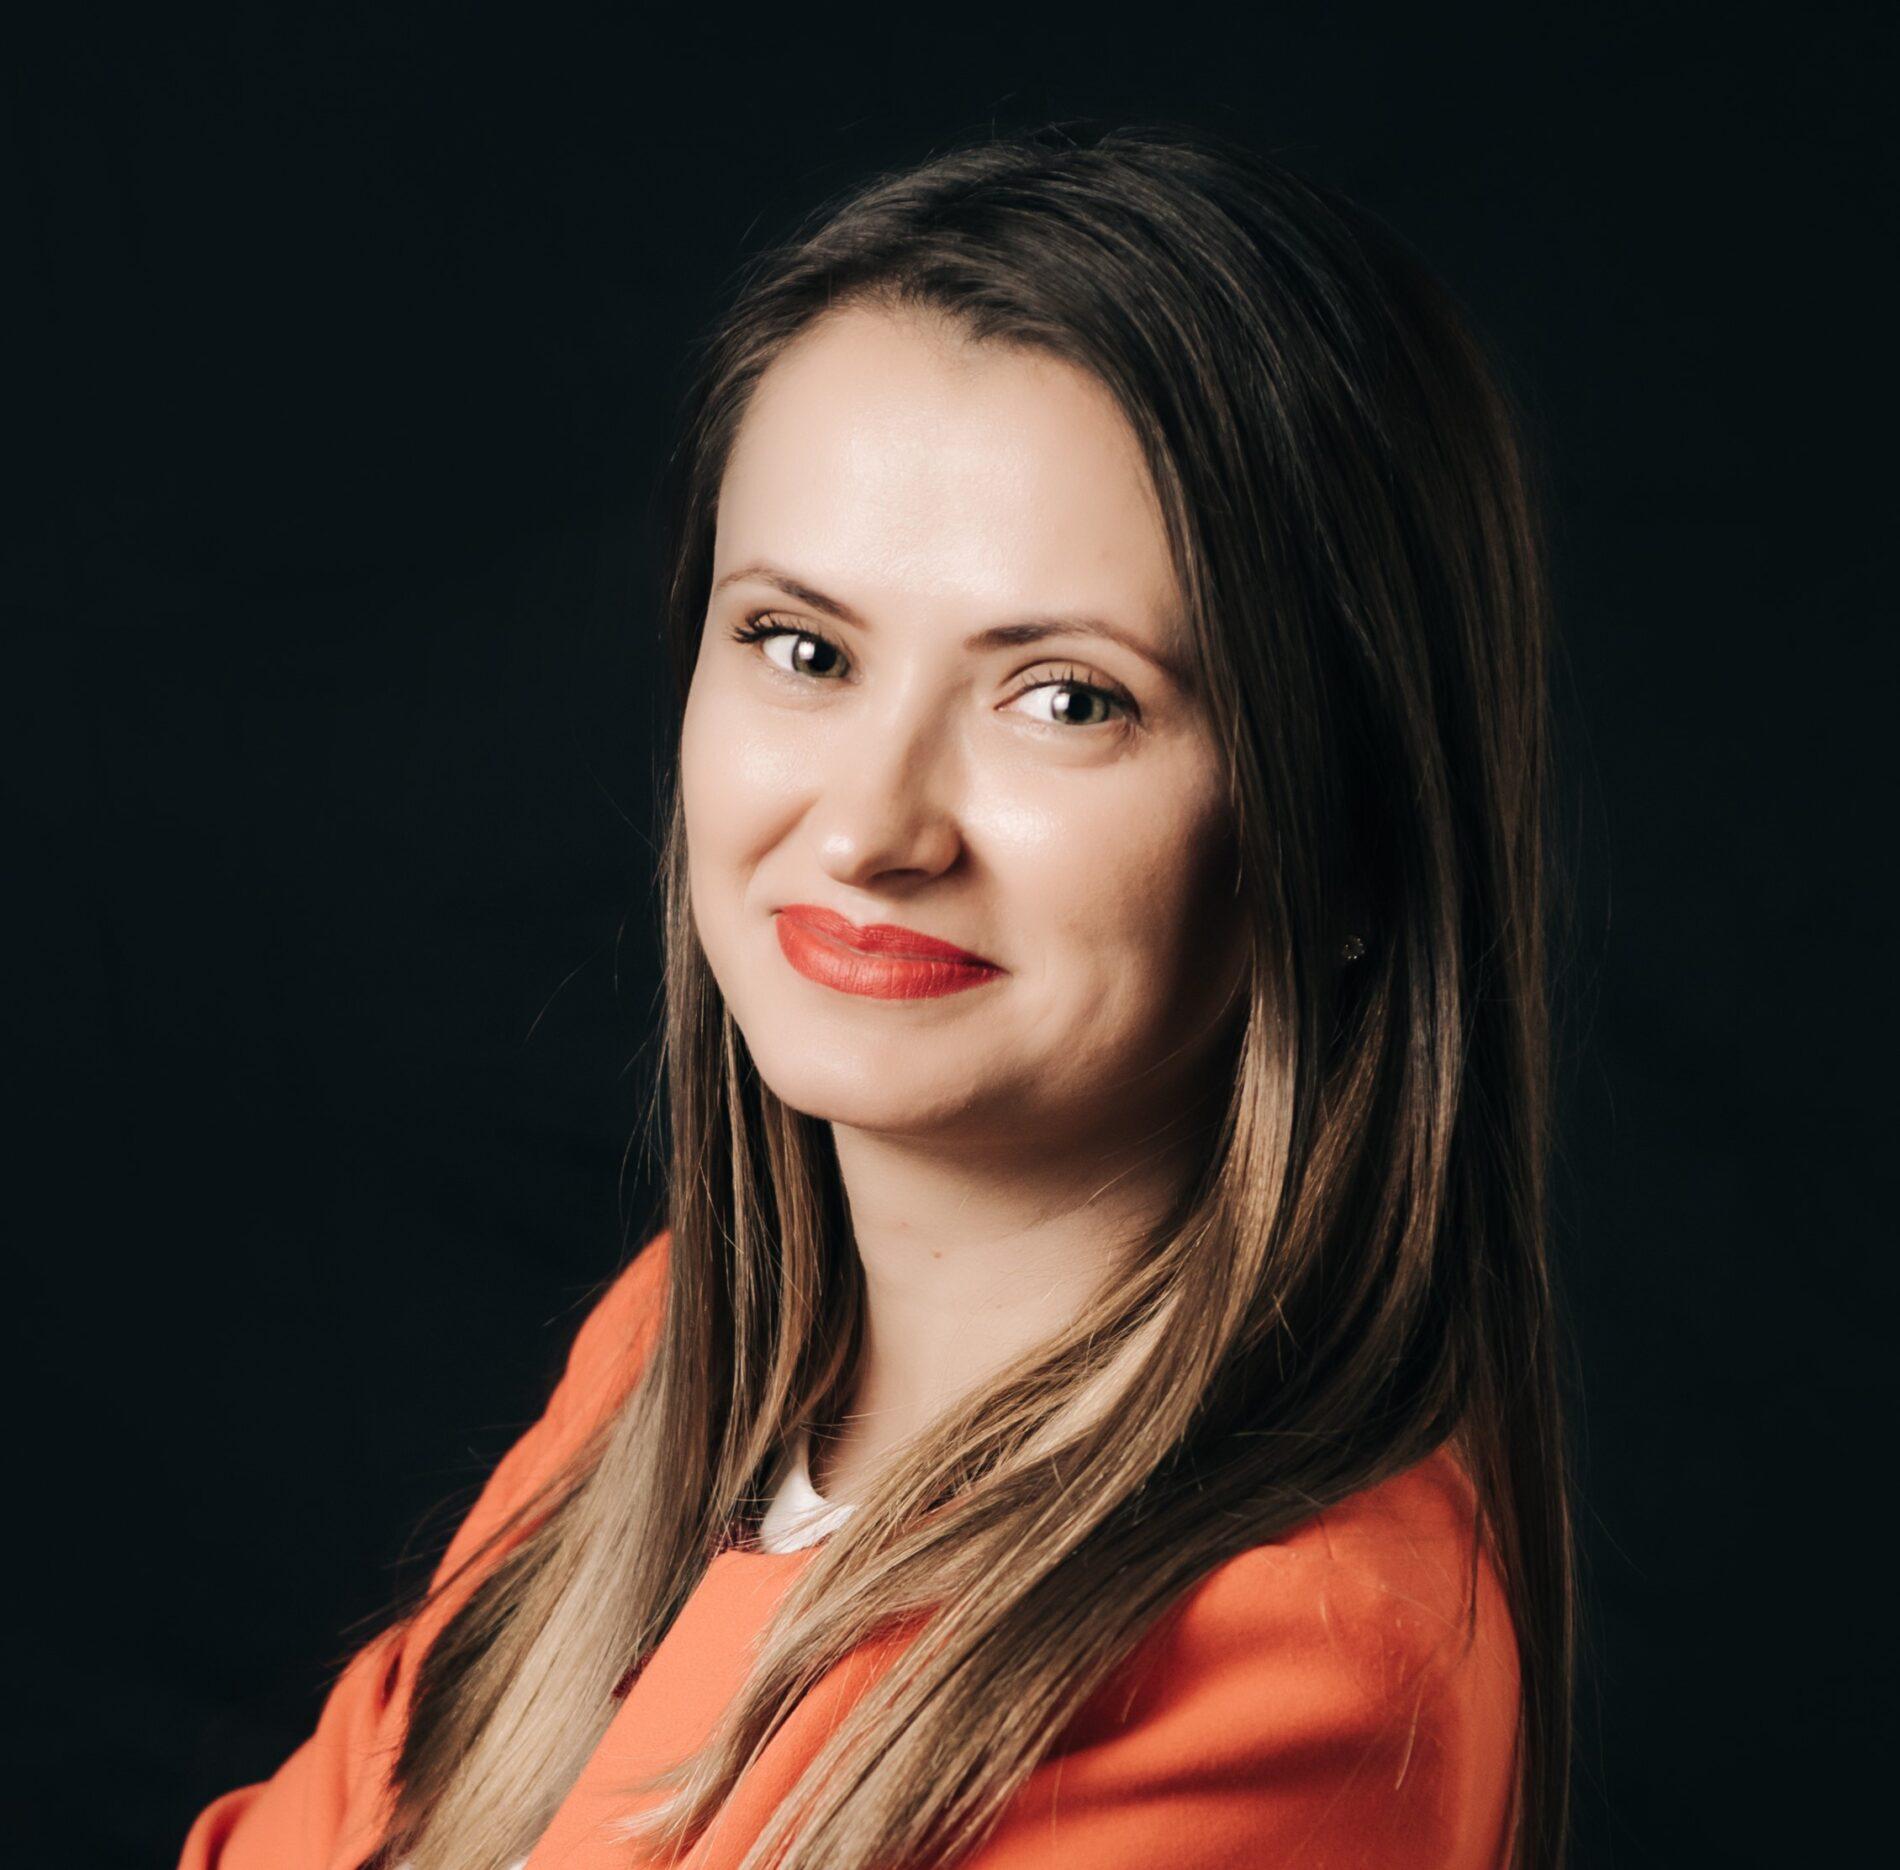 Andreea Damian